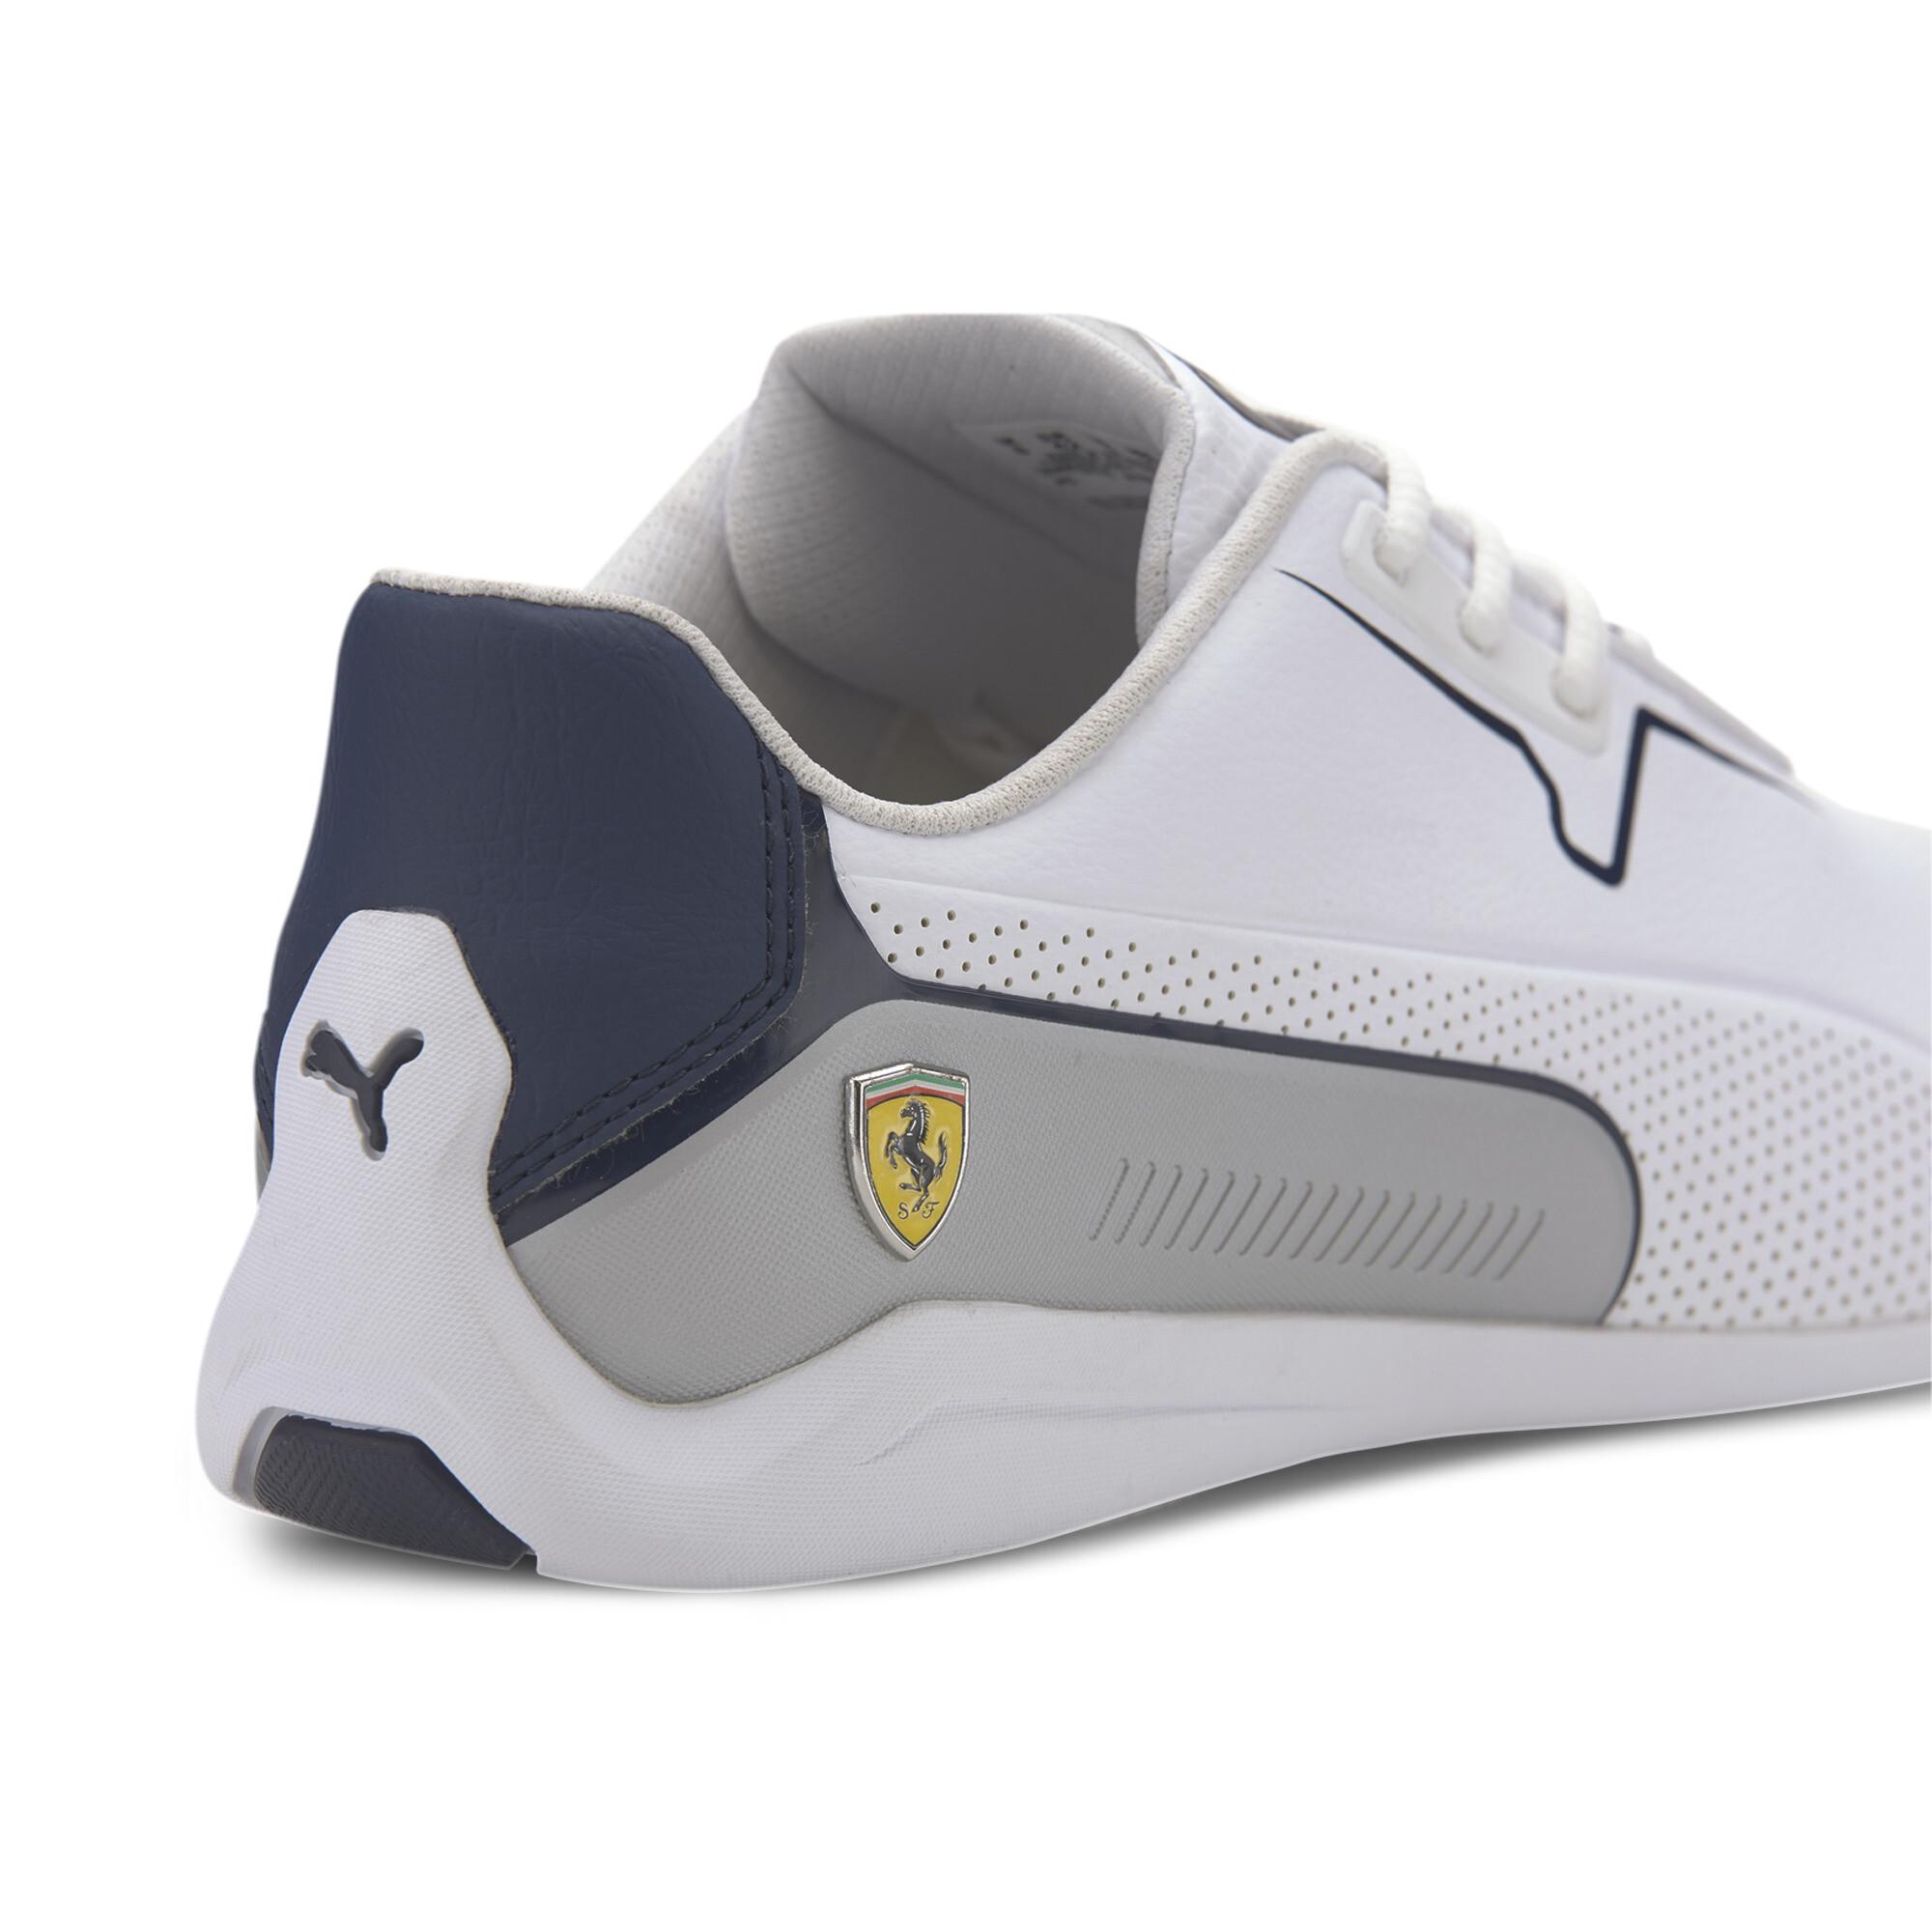 thumbnail 23 - PUMA Men's Scuderia Ferrari Drift Cat 8 Motorsport Shoes